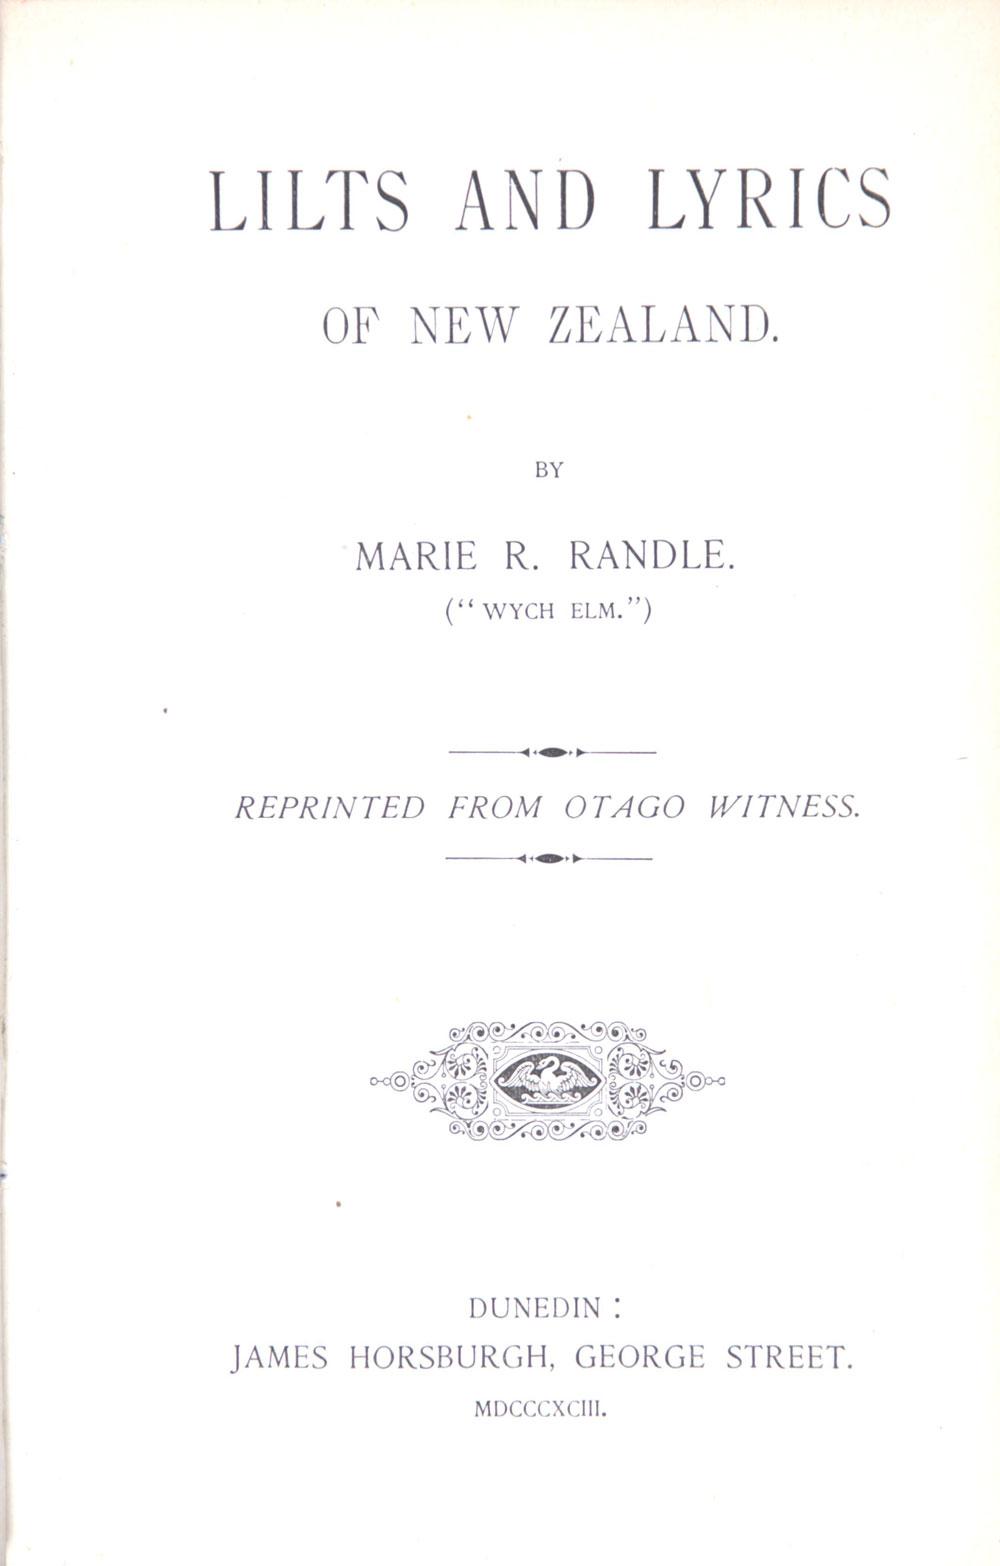 Marie R. Randle. <em>Lilts and lyrics of New Zealand.</em> Dunedin: Horsburgh, 1893.